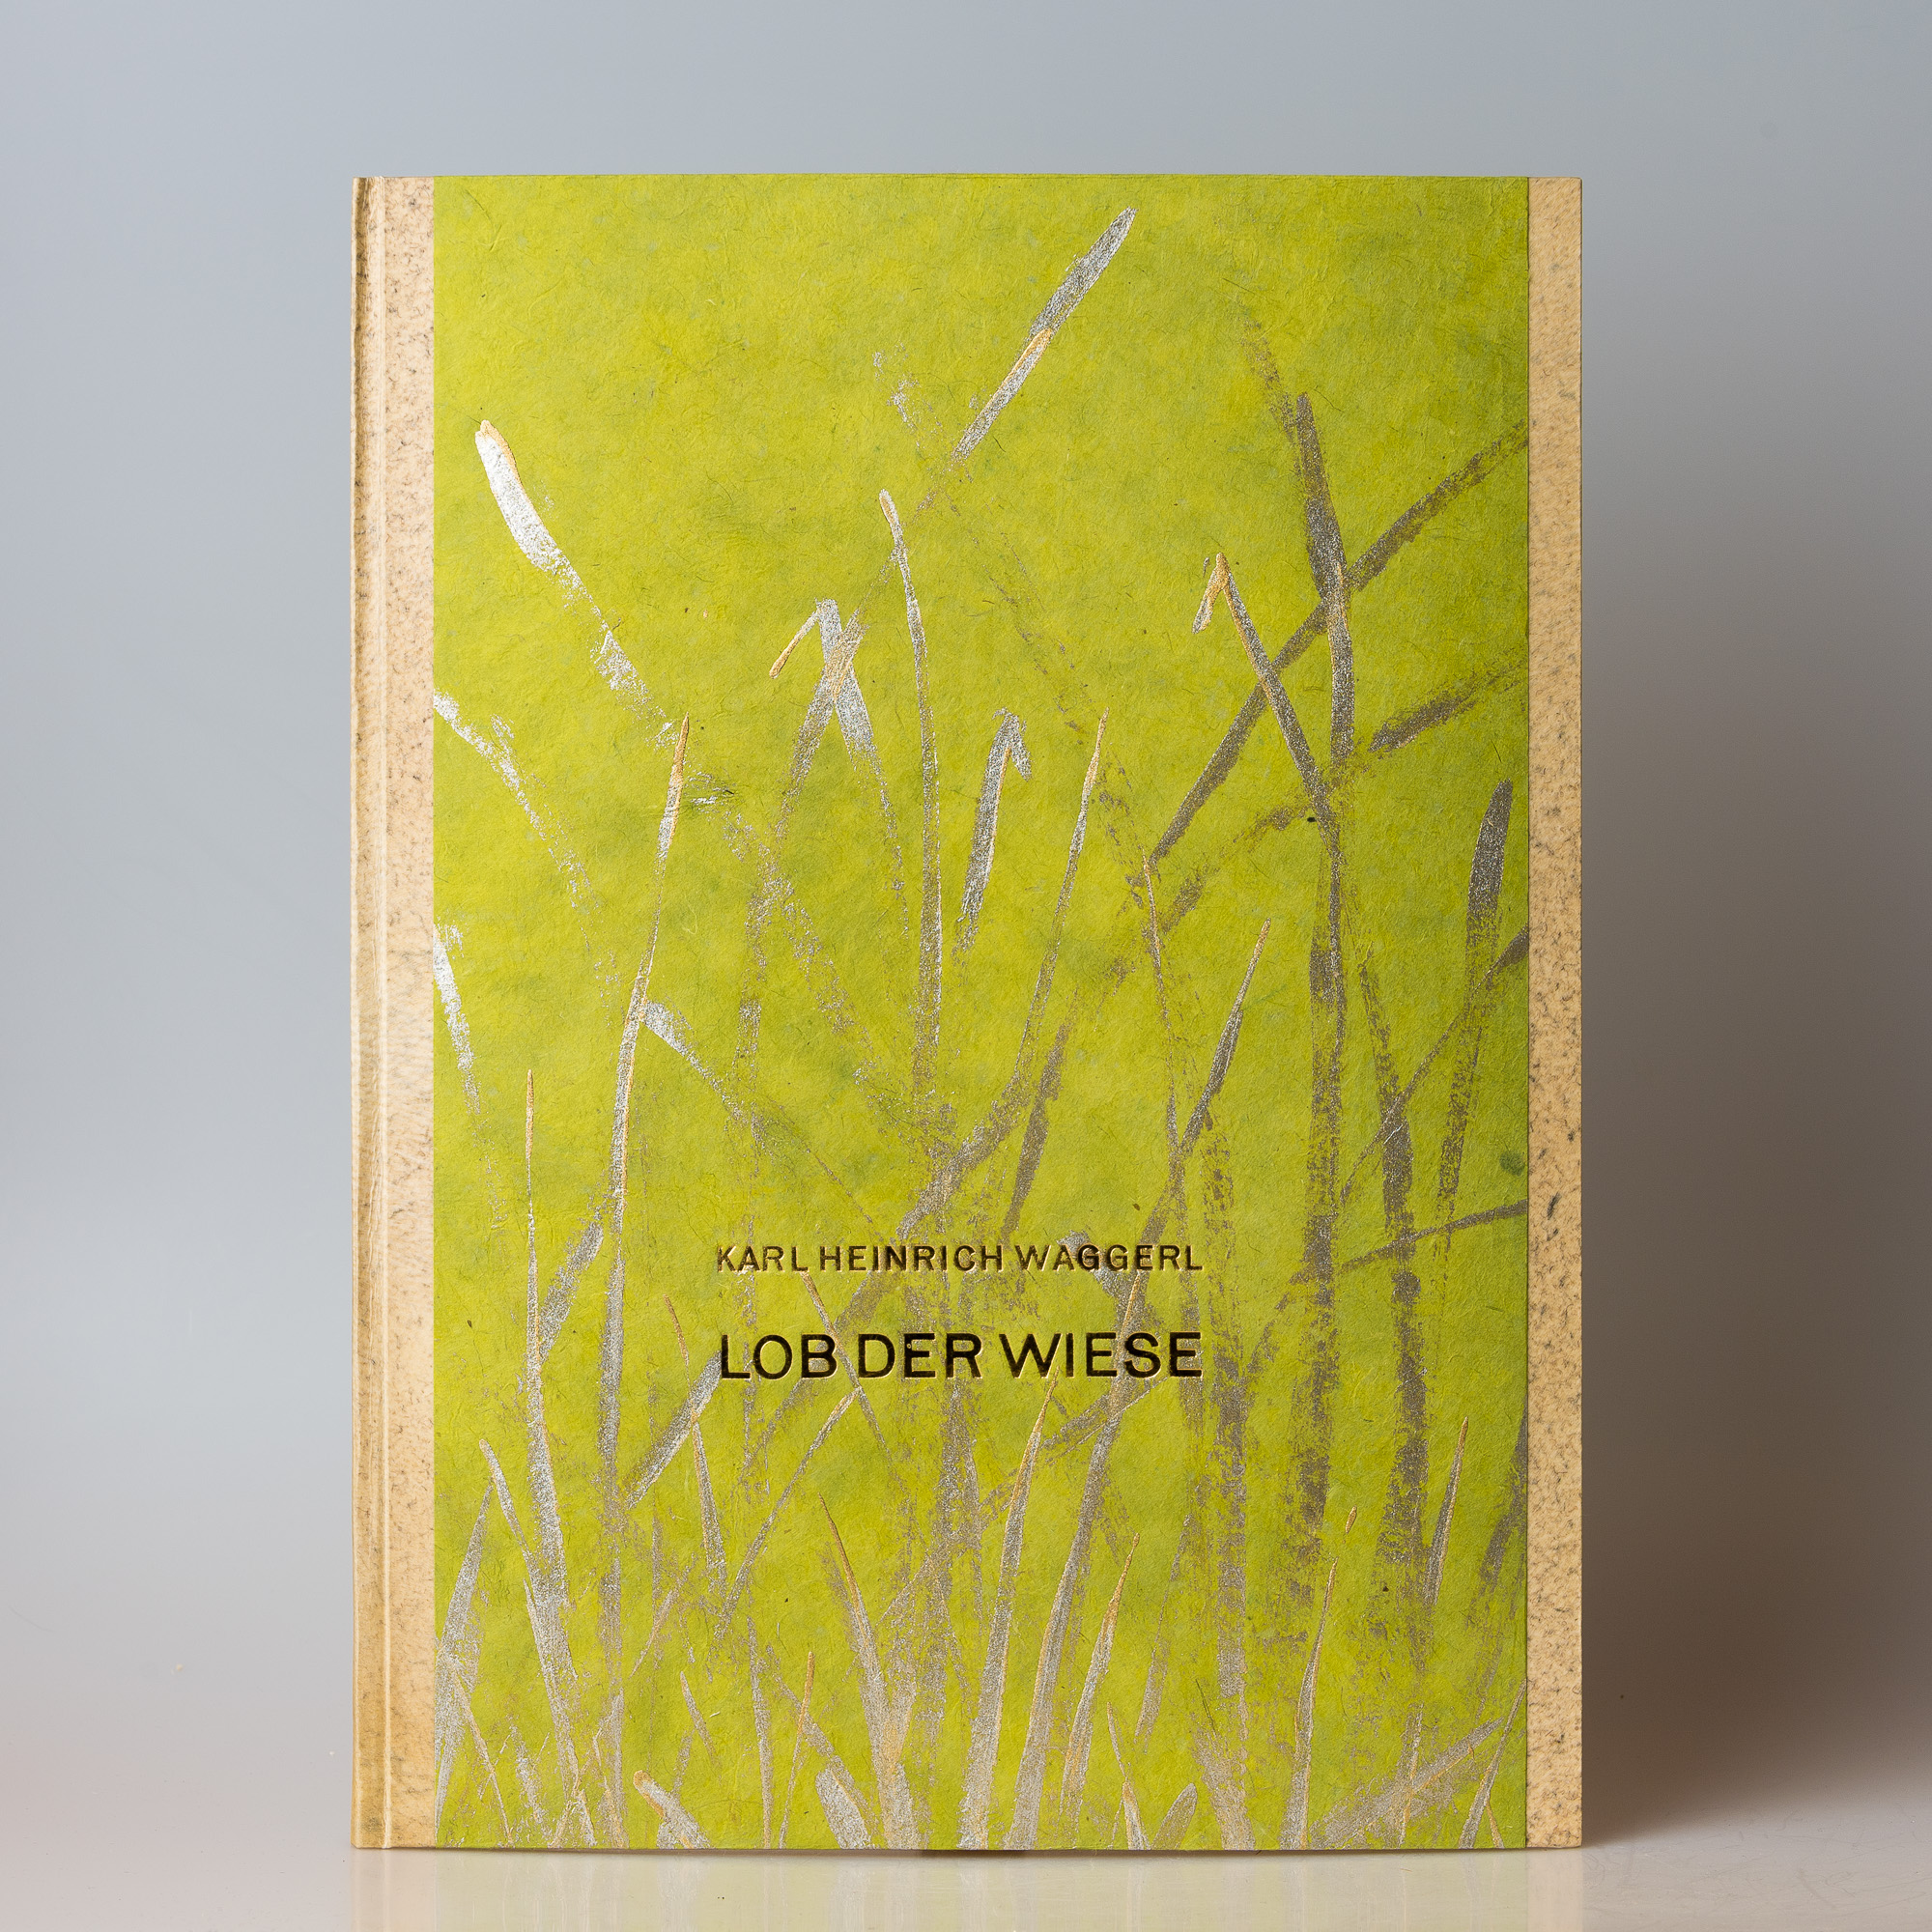 Lob der Wiese, Waggerl, Halbpergamentband  550.-